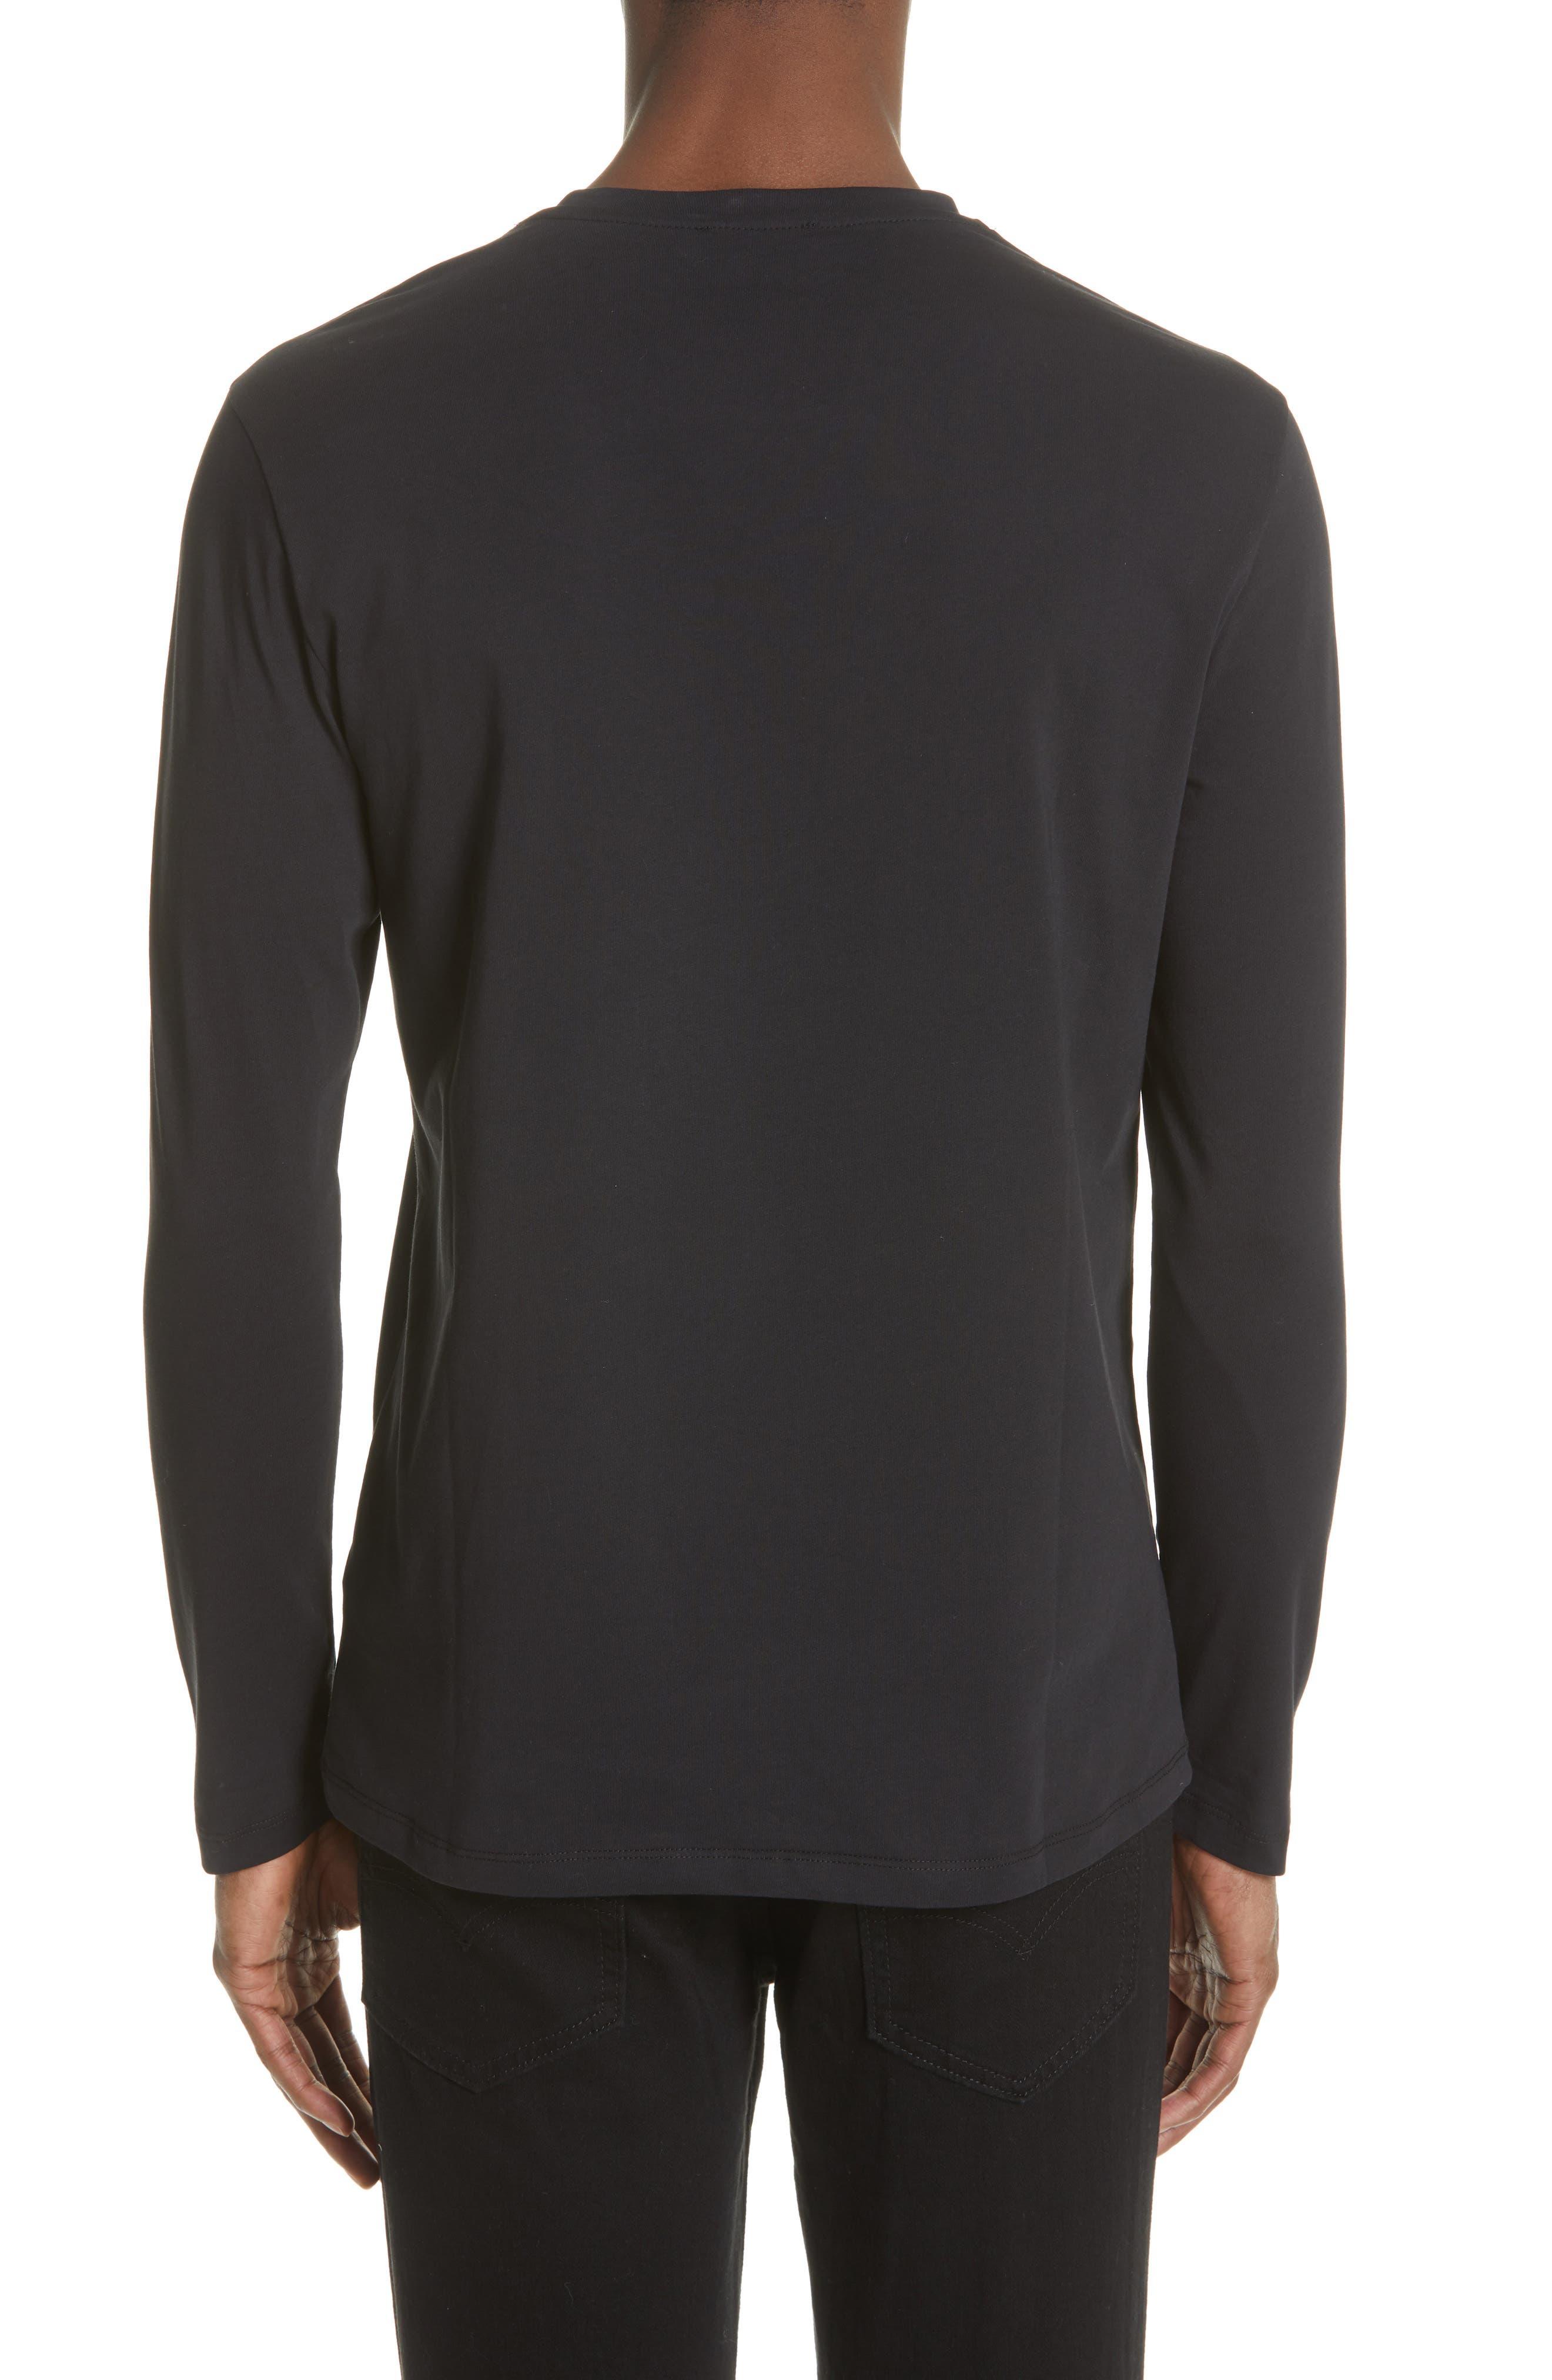 VERSACE COLLECTION, Medusa Long Sleeve T-Shirt, Alternate thumbnail 2, color, 001